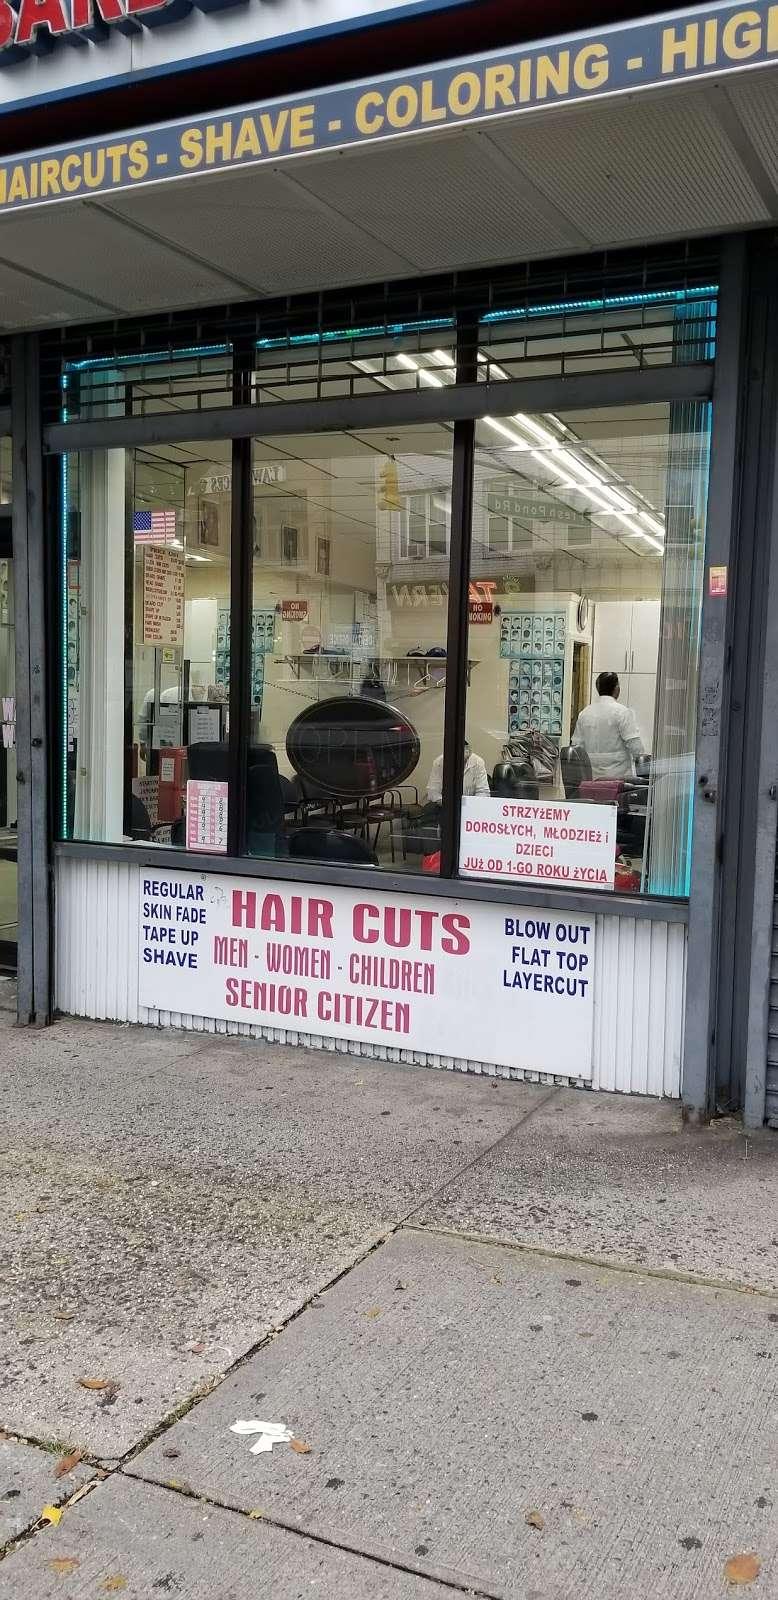 Marks Barber Shop & Beauty Salon - hair care  | Photo 4 of 6 | Address: 68-68 Fresh Pond Rd, Ridgewood, NY 11385, USA